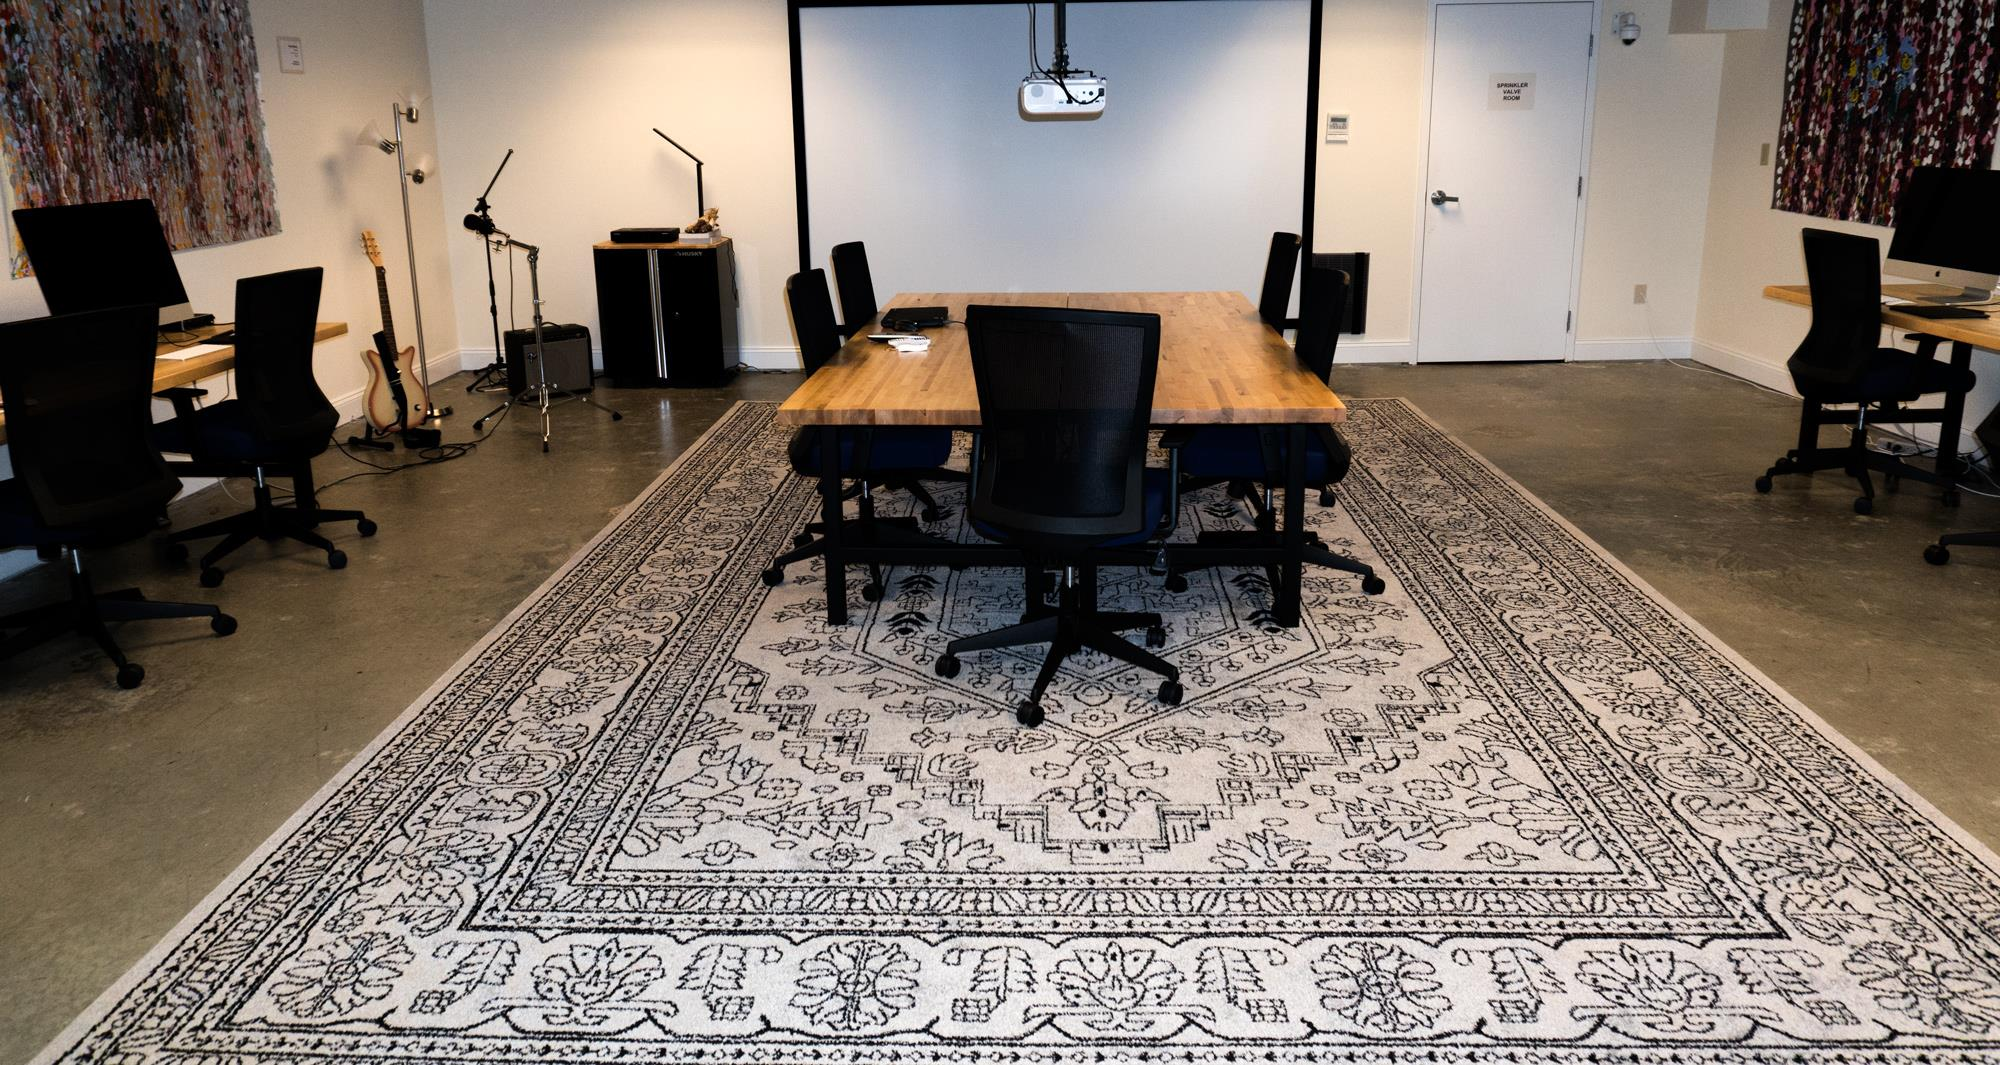 Saugatuck Digital Arts Workshop, LLC - Meeting Room 1